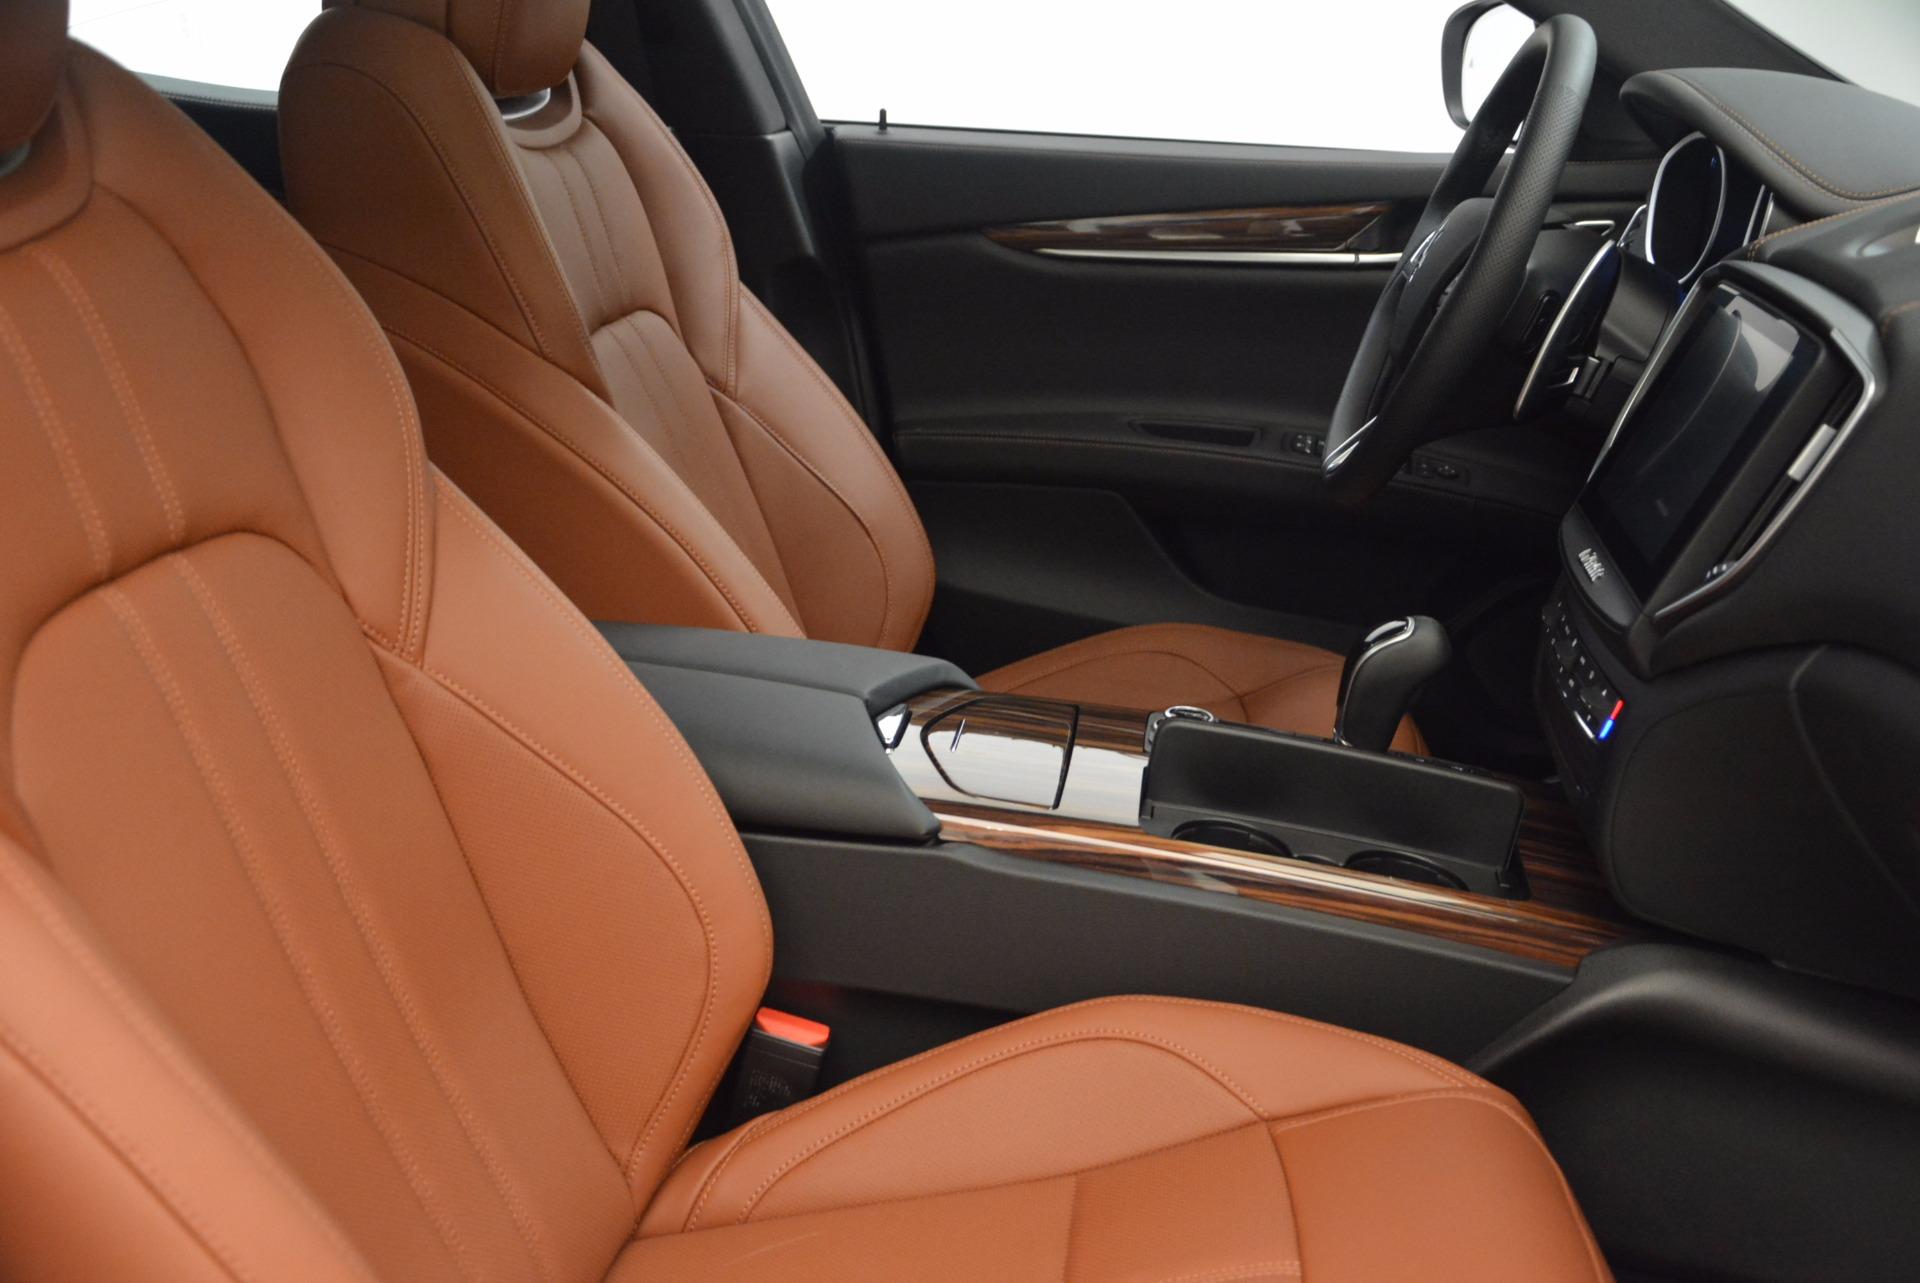 New 2018 Maserati Ghibli S Q4 Gransport For Sale In Westport, CT 1562_p20